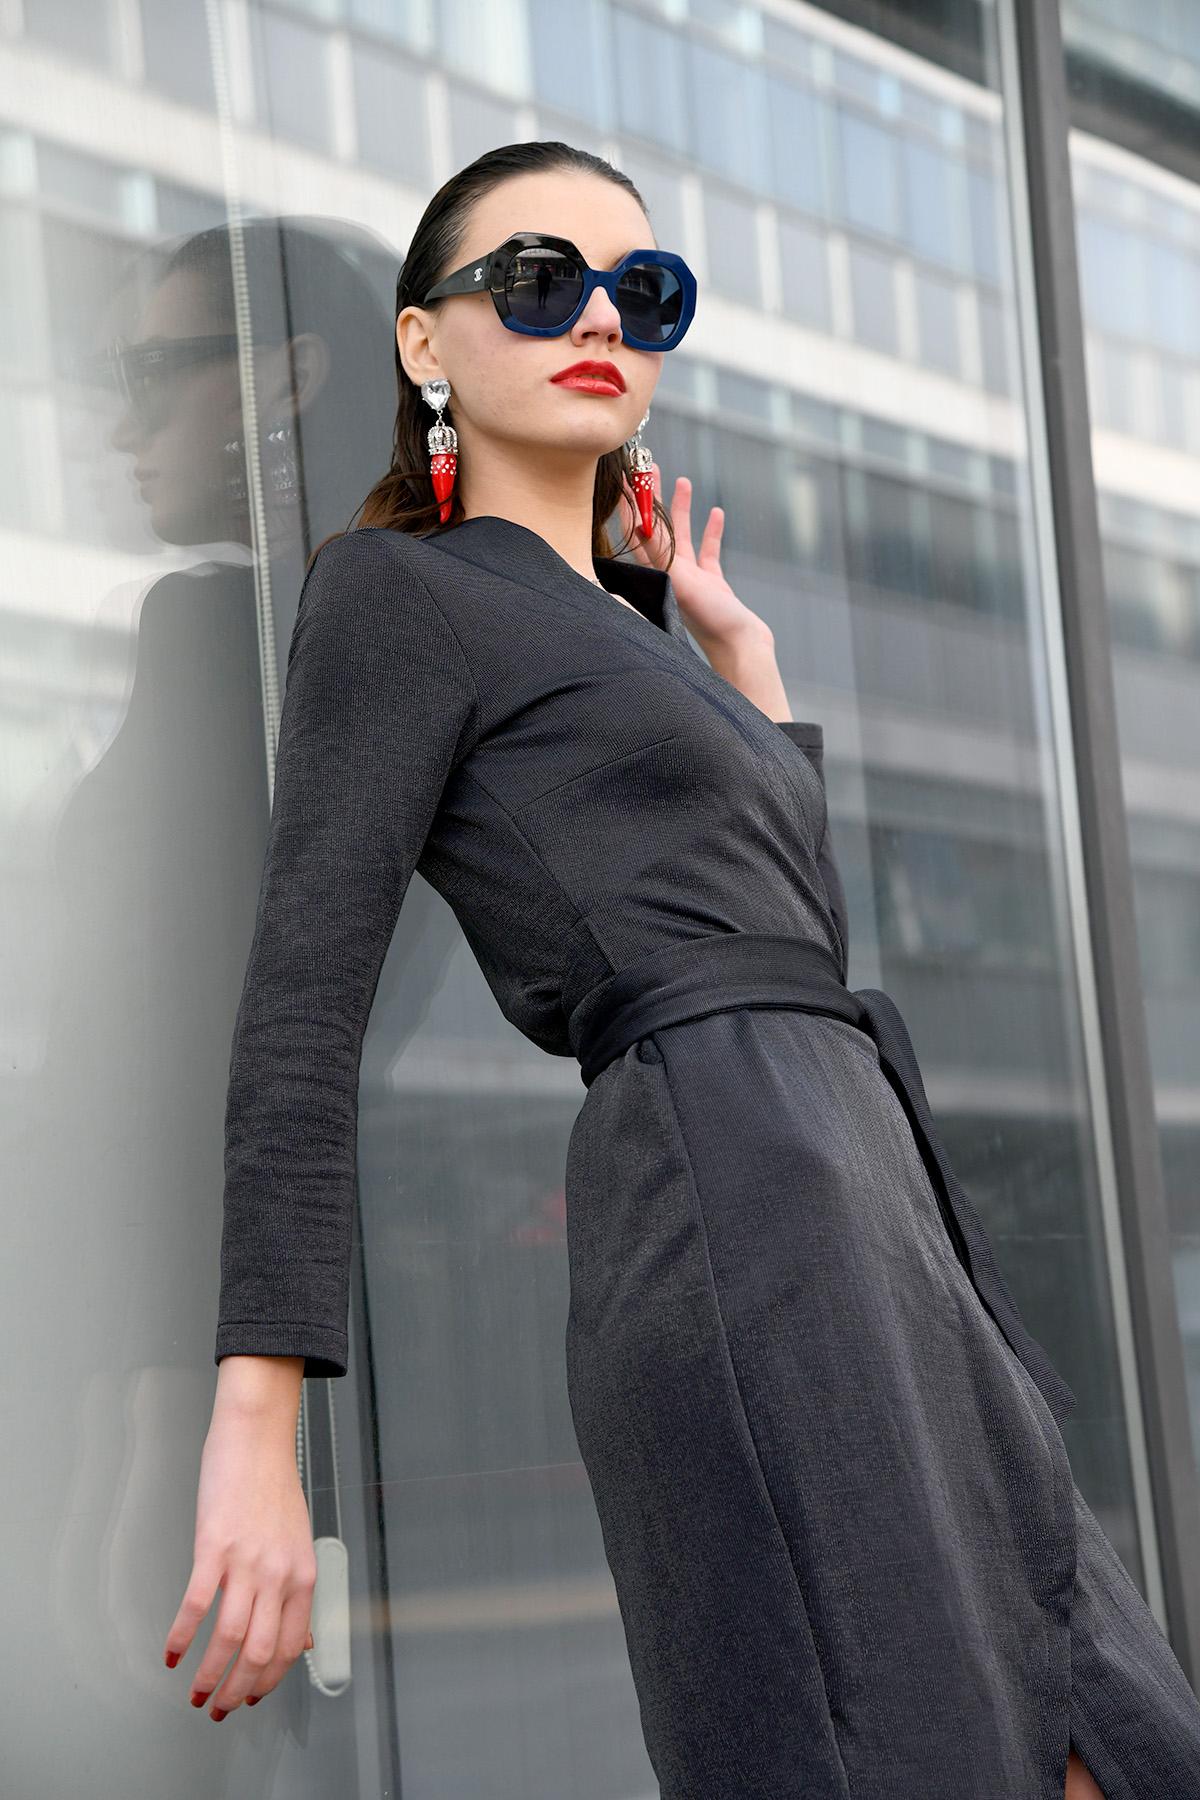 Extravagant editorijal: Urban Duchess